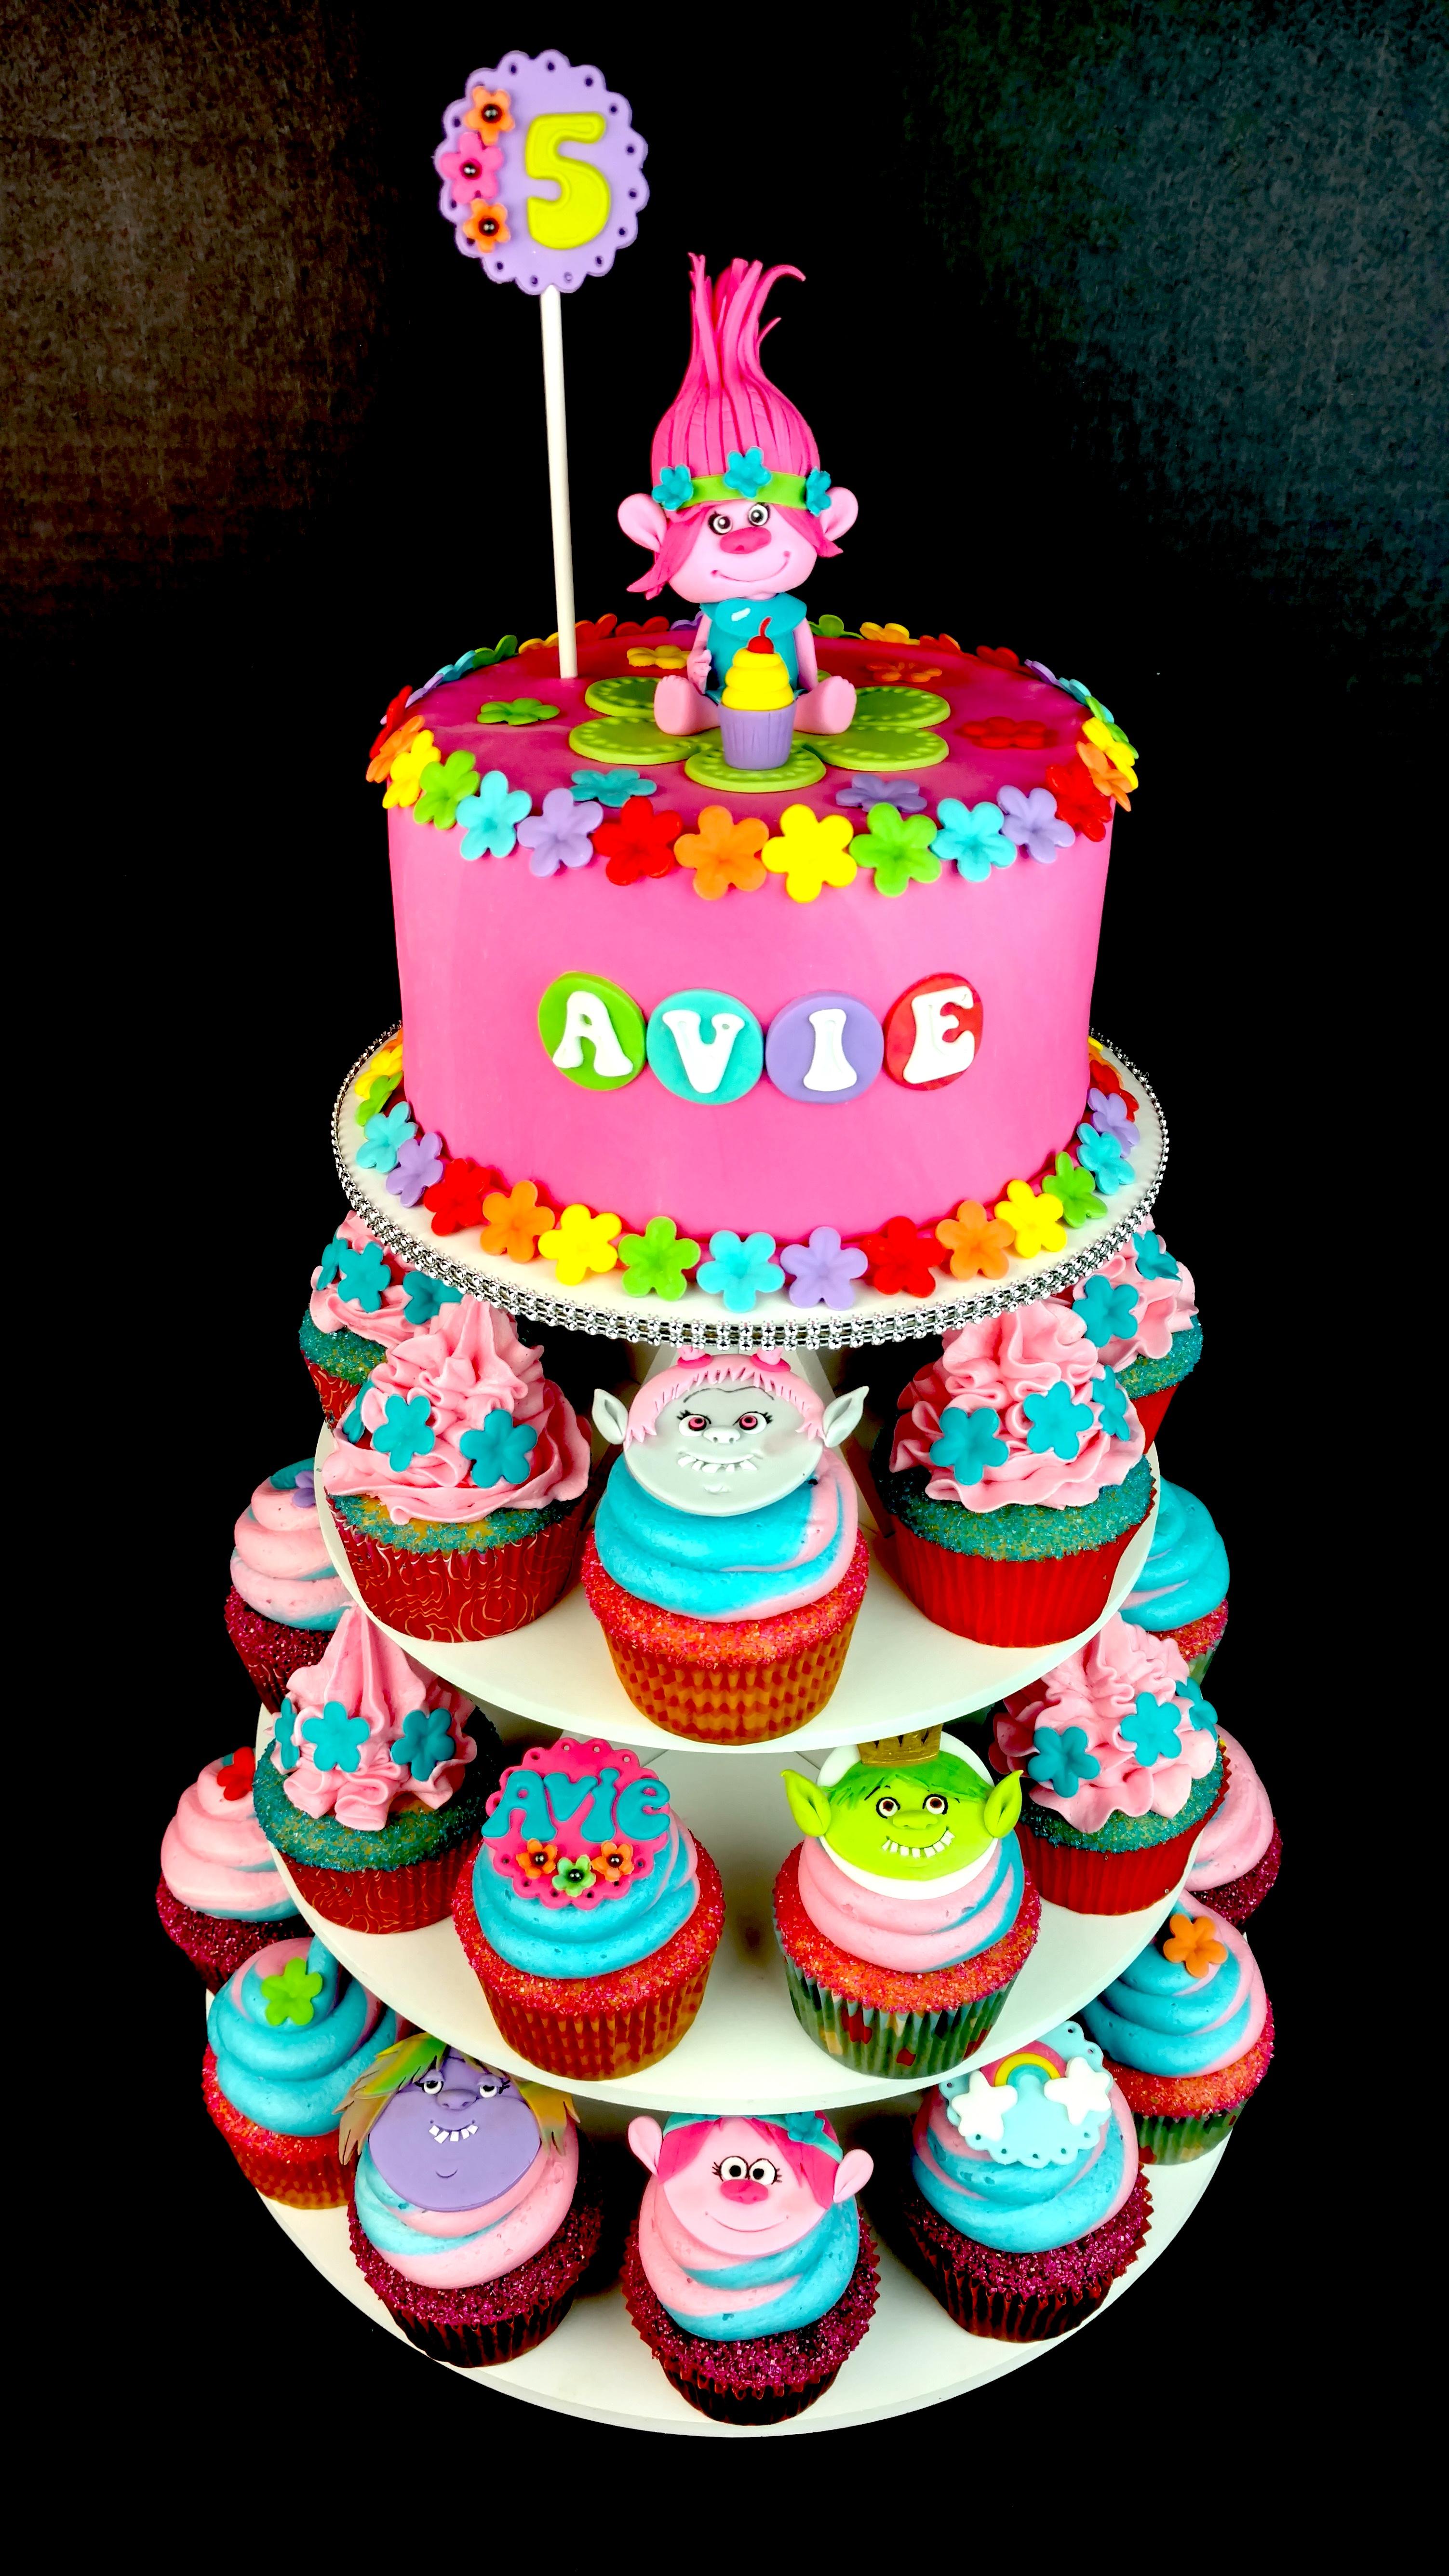 Avie's Trolls Cake and Cupcakes